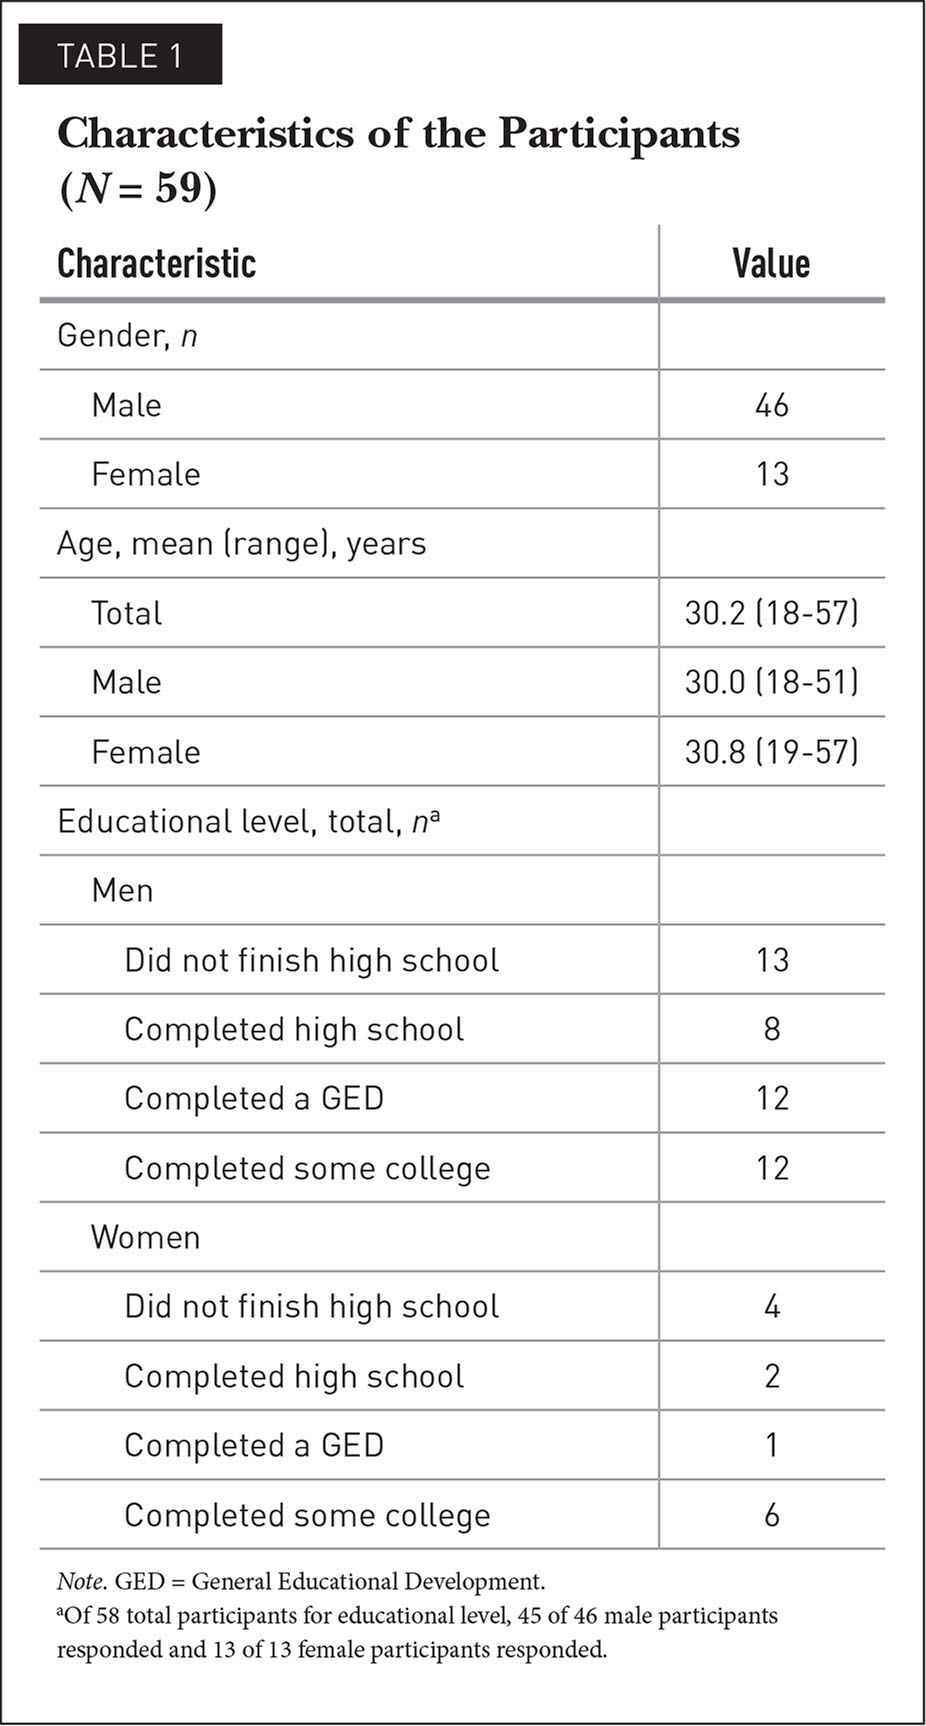 Characteristics of the Participants (N = 59)